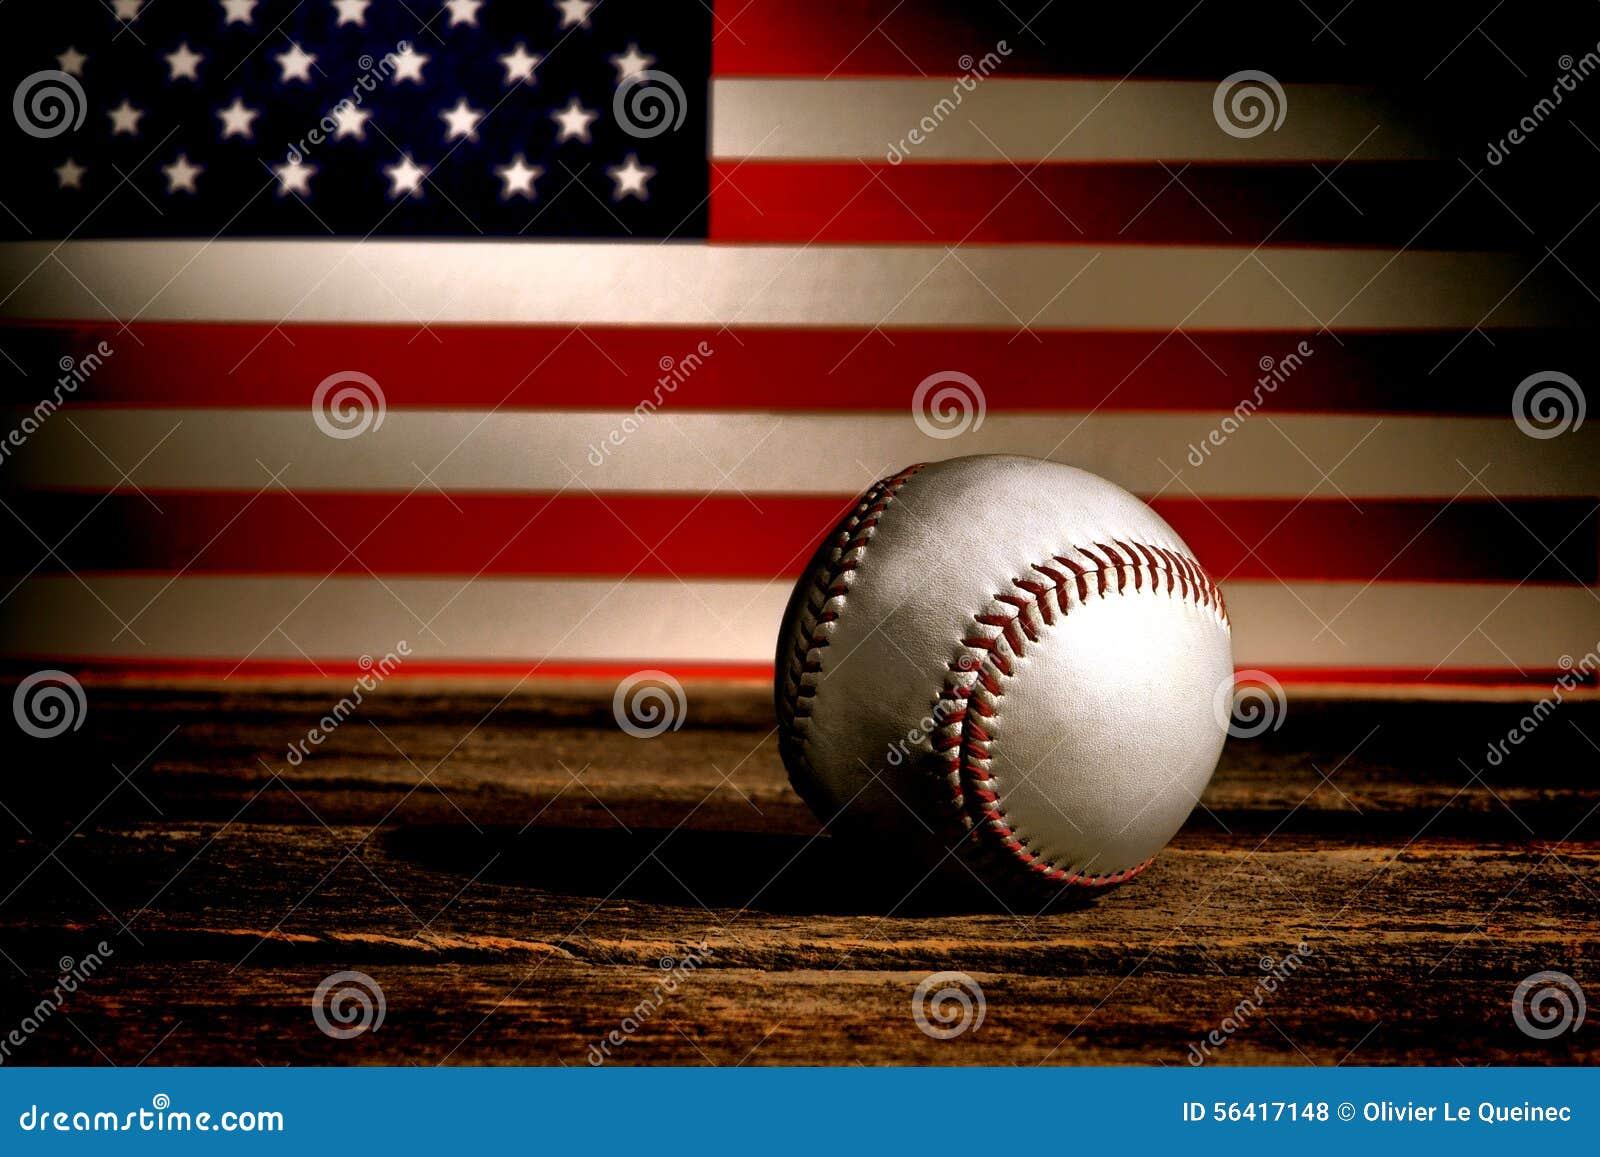 Vintage Baseball Ball And Patriotic American Flag Stock Photo ...